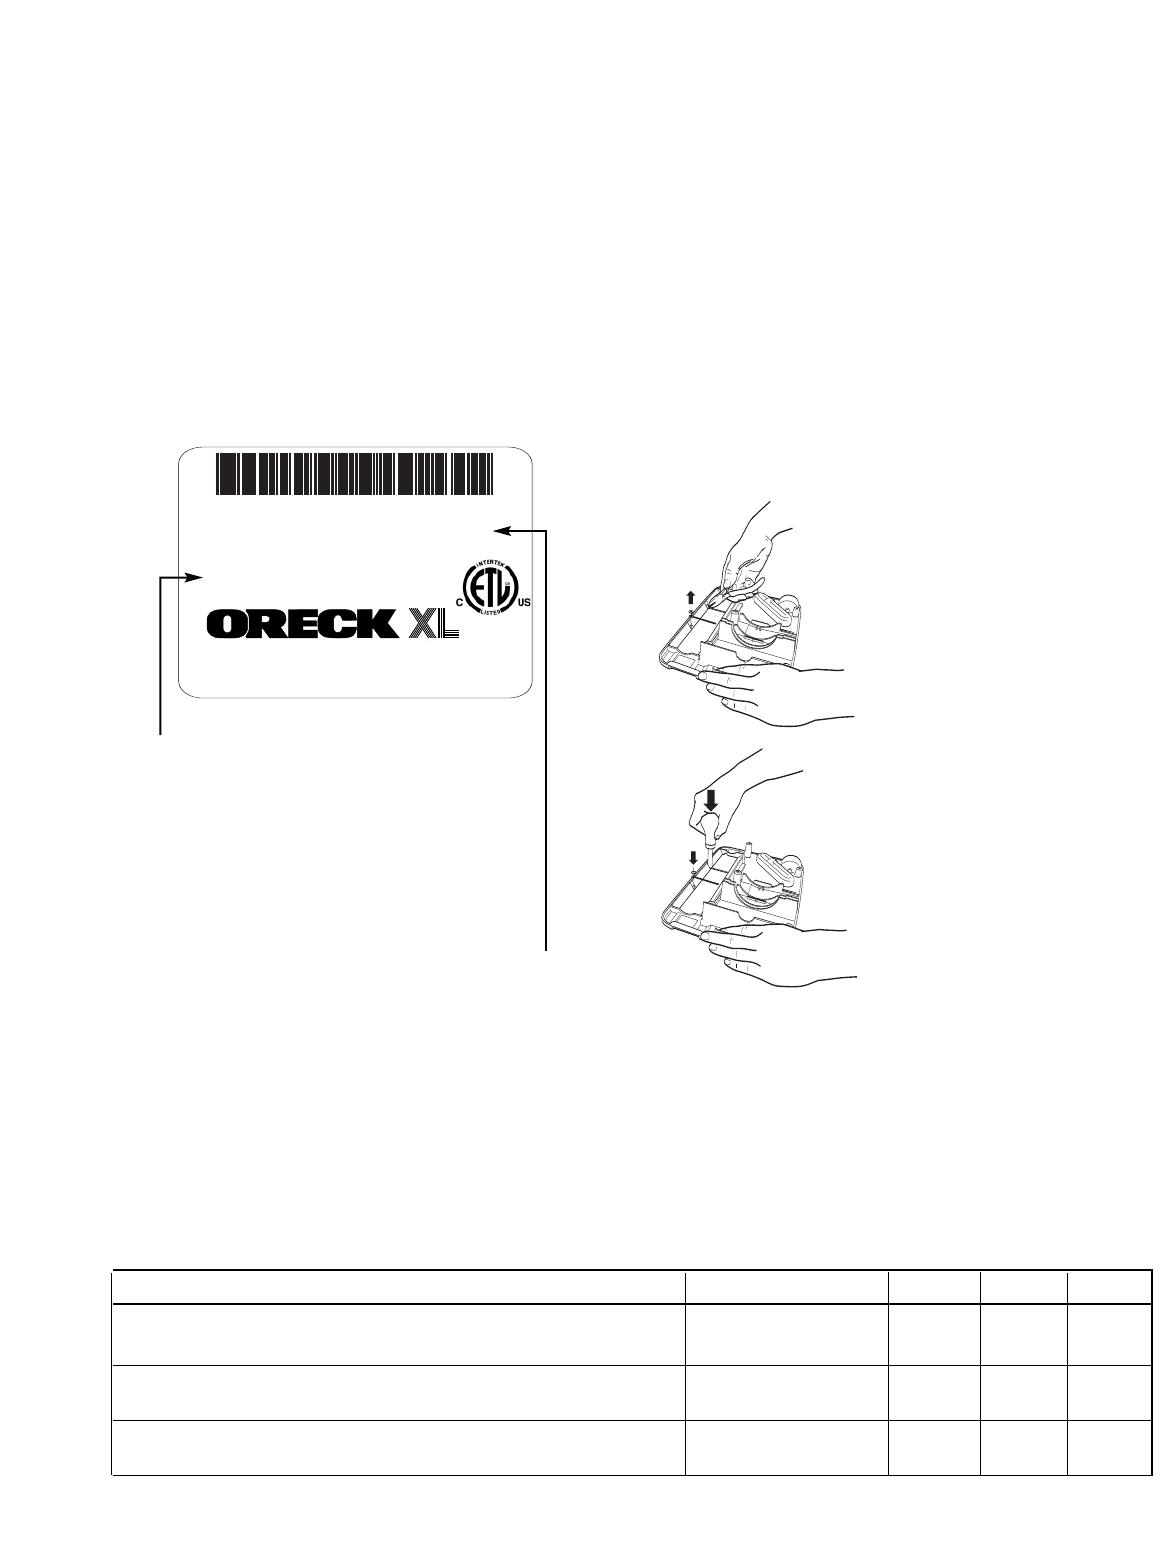 wiring diagram oreck x9100 wiring diagram oreck xl3610hh wiring diagram e7  wiring diagram oreck xl3610hh wiring